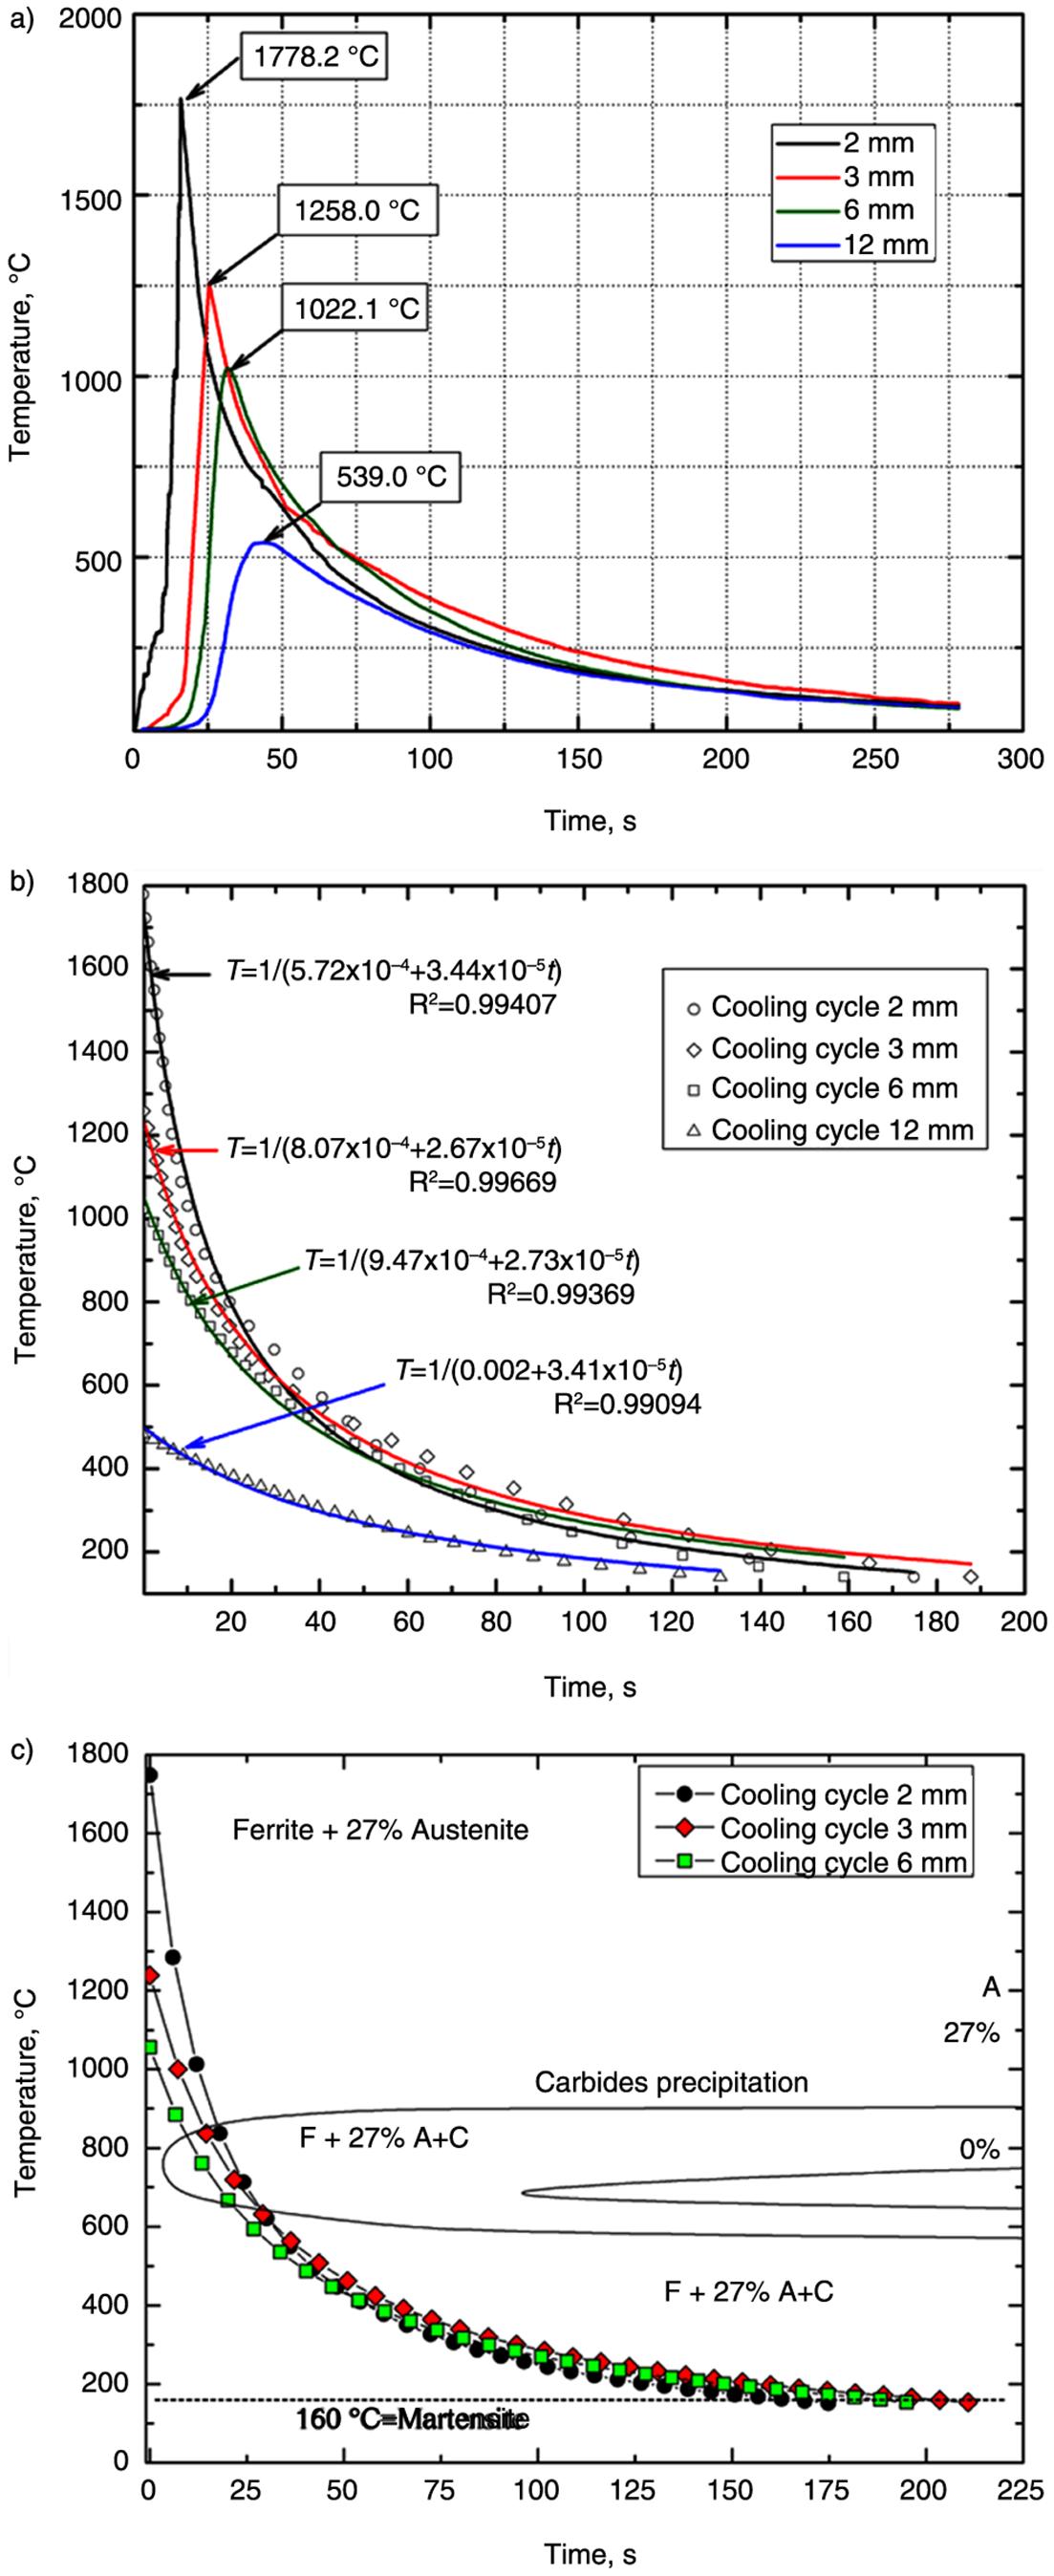 Welding Cct Diagram Wiring Generator Schematic Efecto Del Calor De Aporte Sobre La Transformacin Microestructural Of Weld Metal